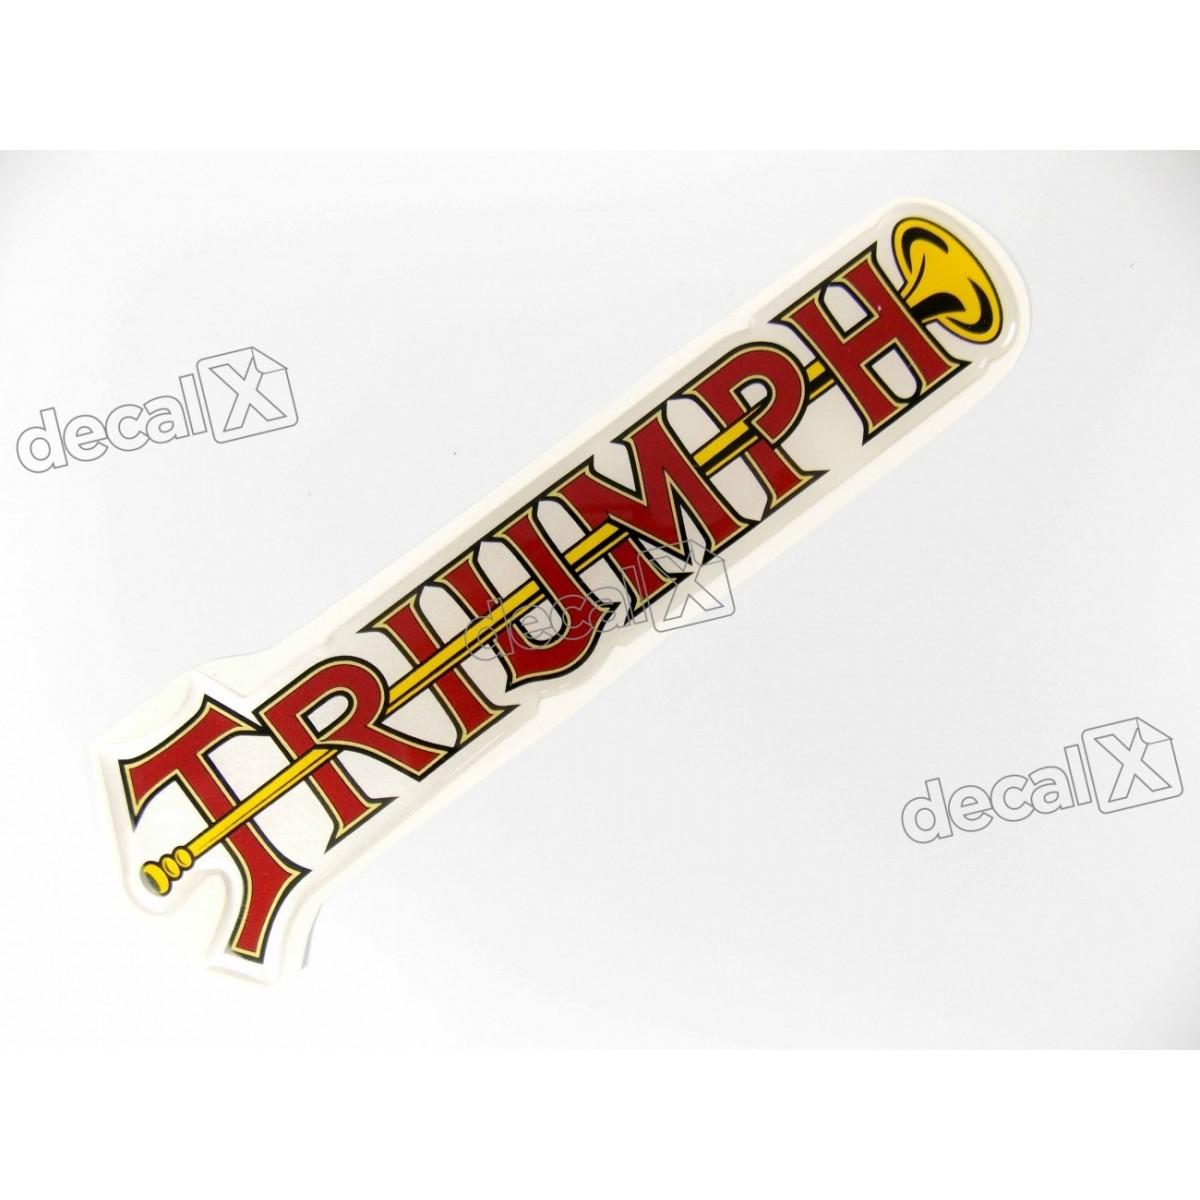 Adesivo Triumph Resinado 4,5x16 Cm Decalx